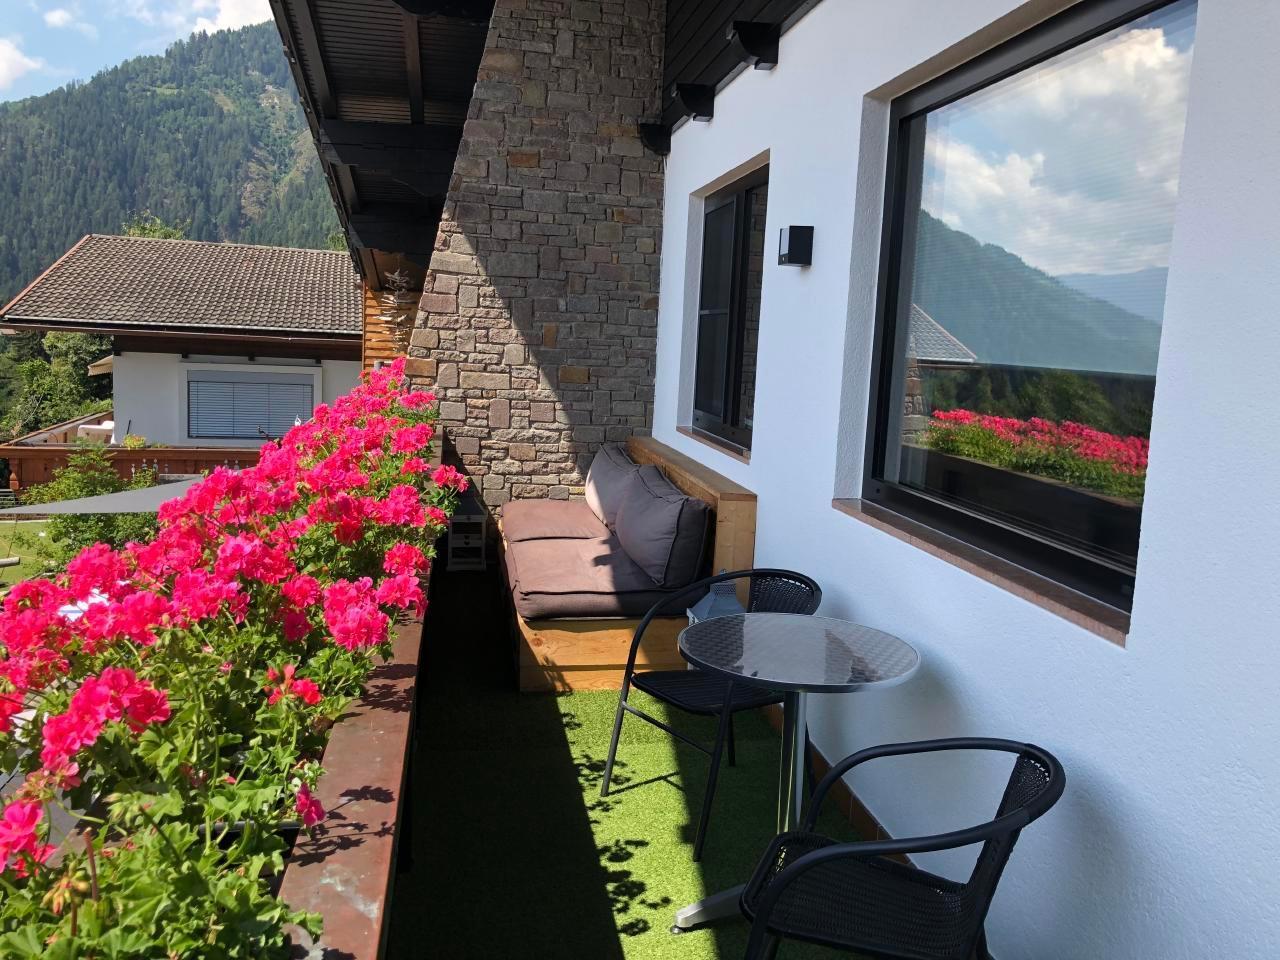 Maison de vacances Landhaus Osttirol (2299545), Dölsach, Osttirol, Tyrol, Autriche, image 41